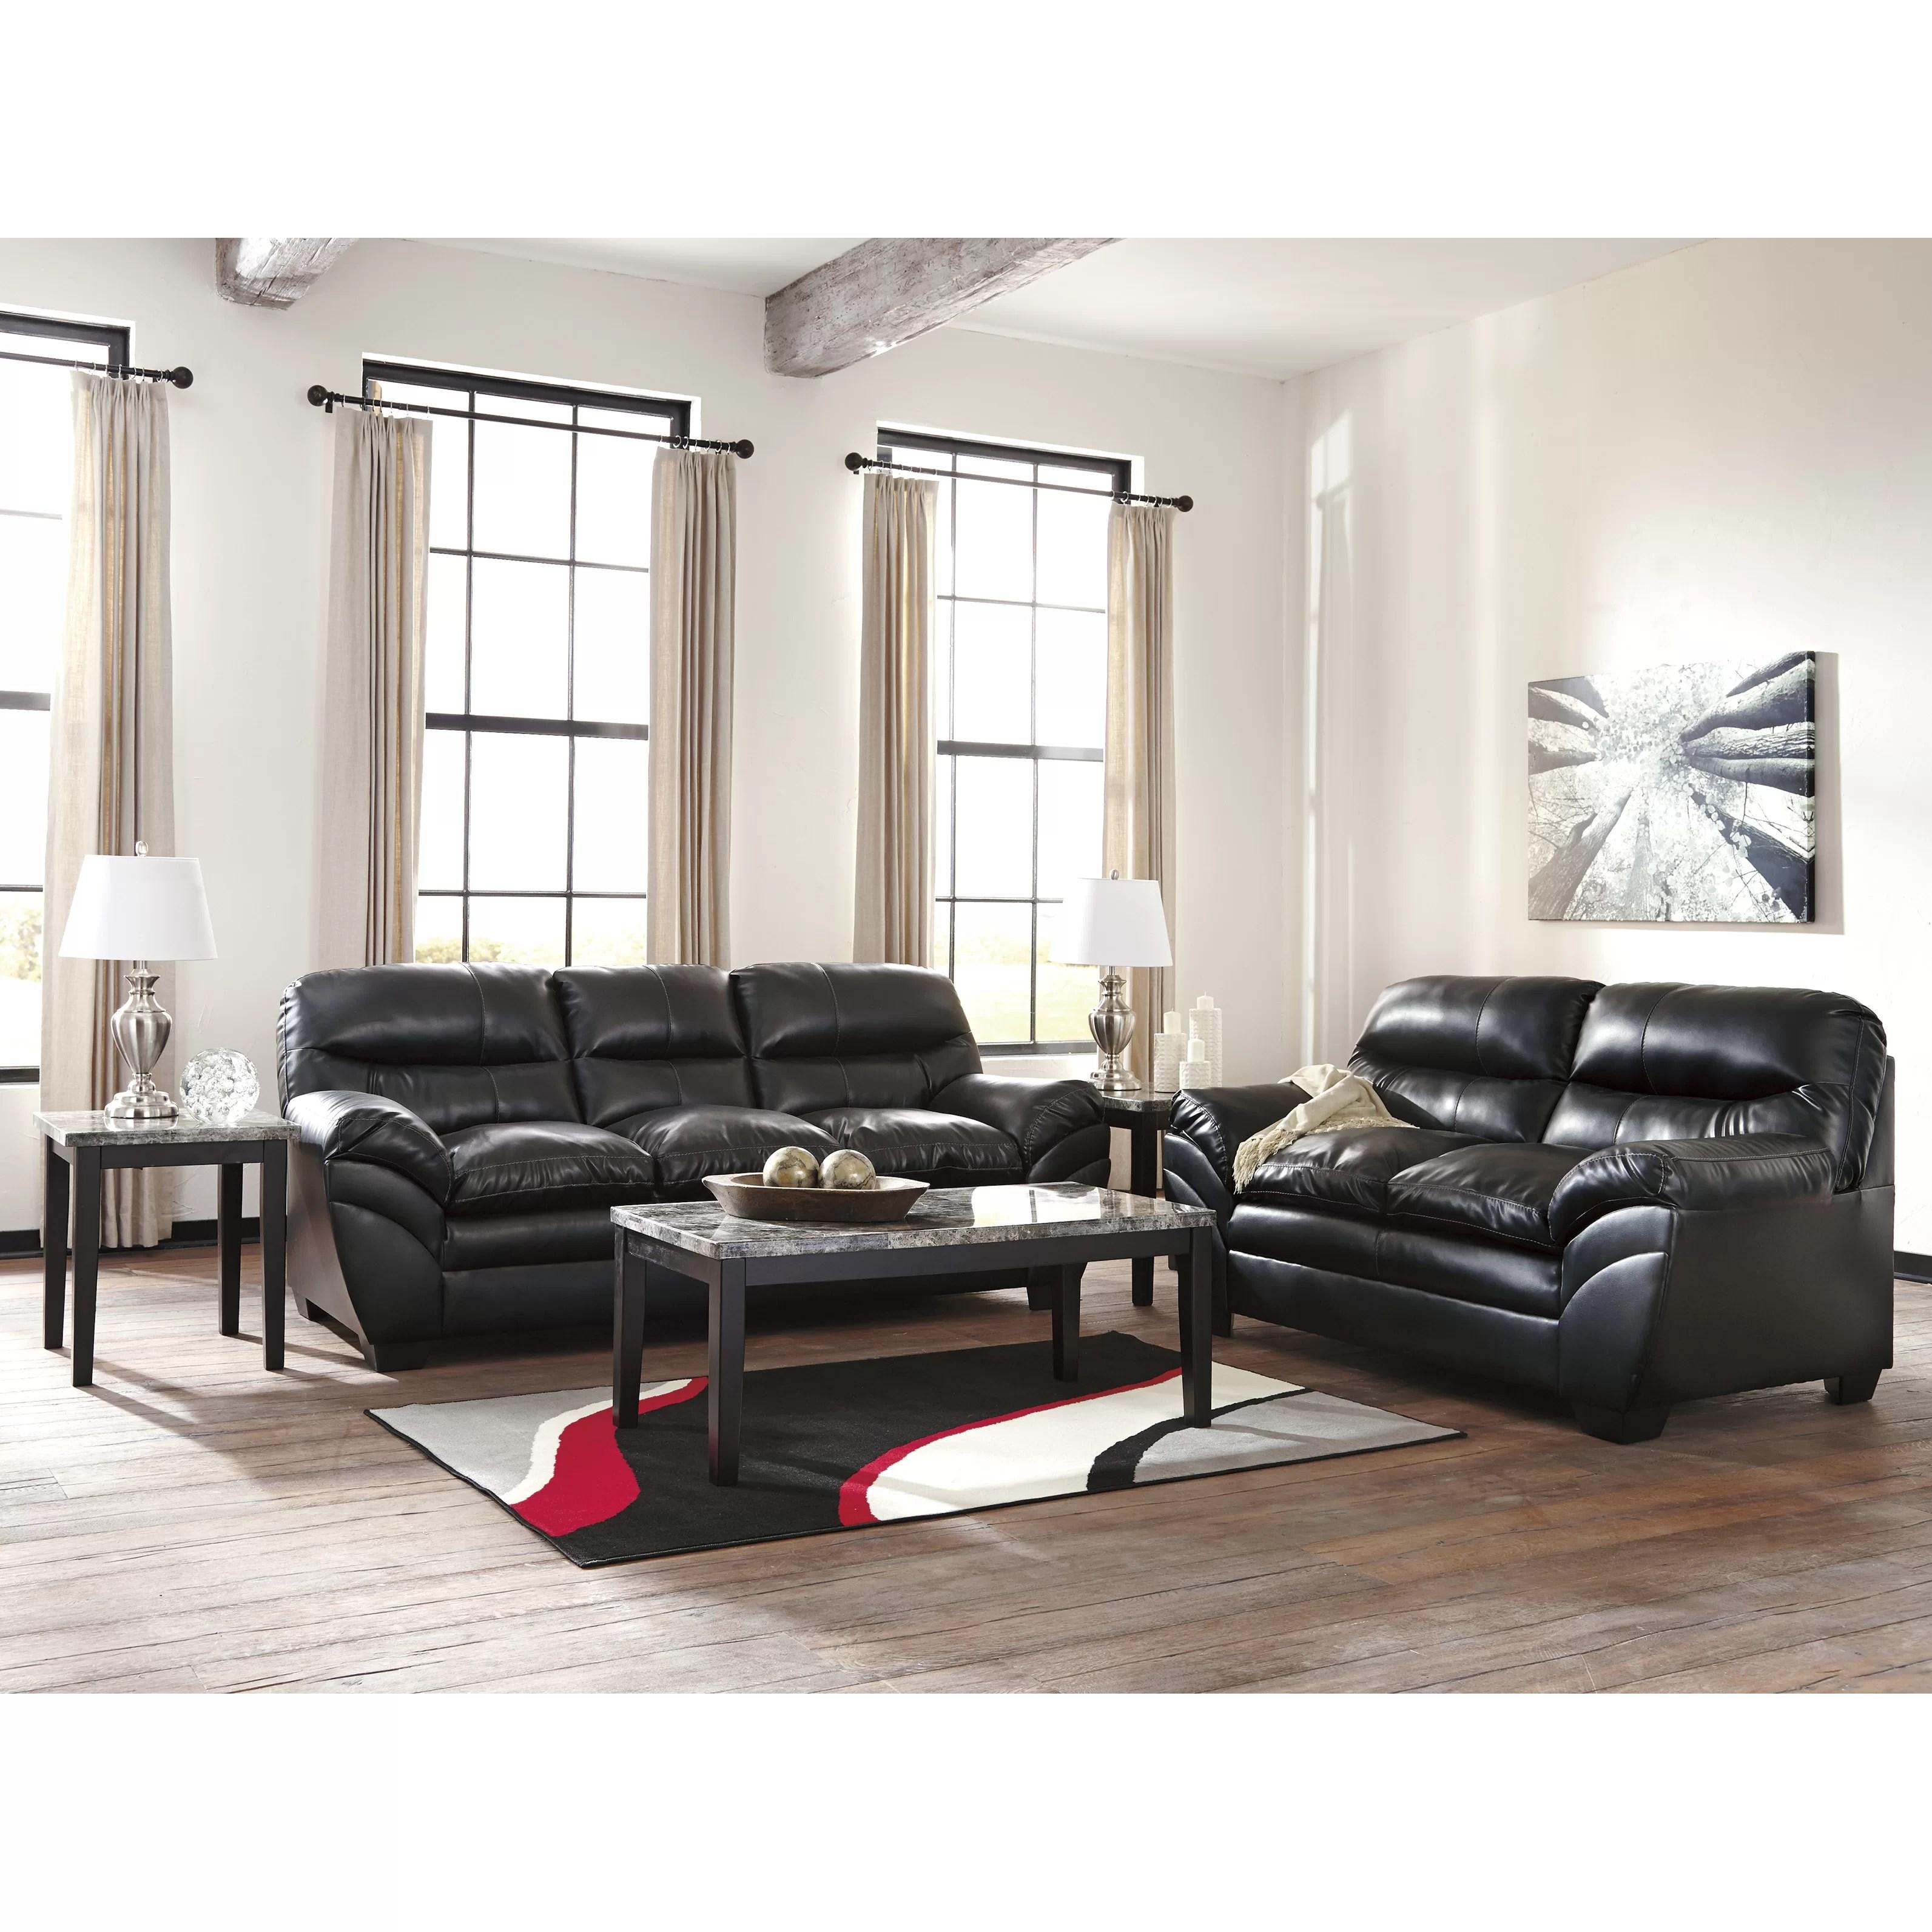 signature design by ashley harvest sleeper sofa sofaer and co menu tassler reviews wayfair